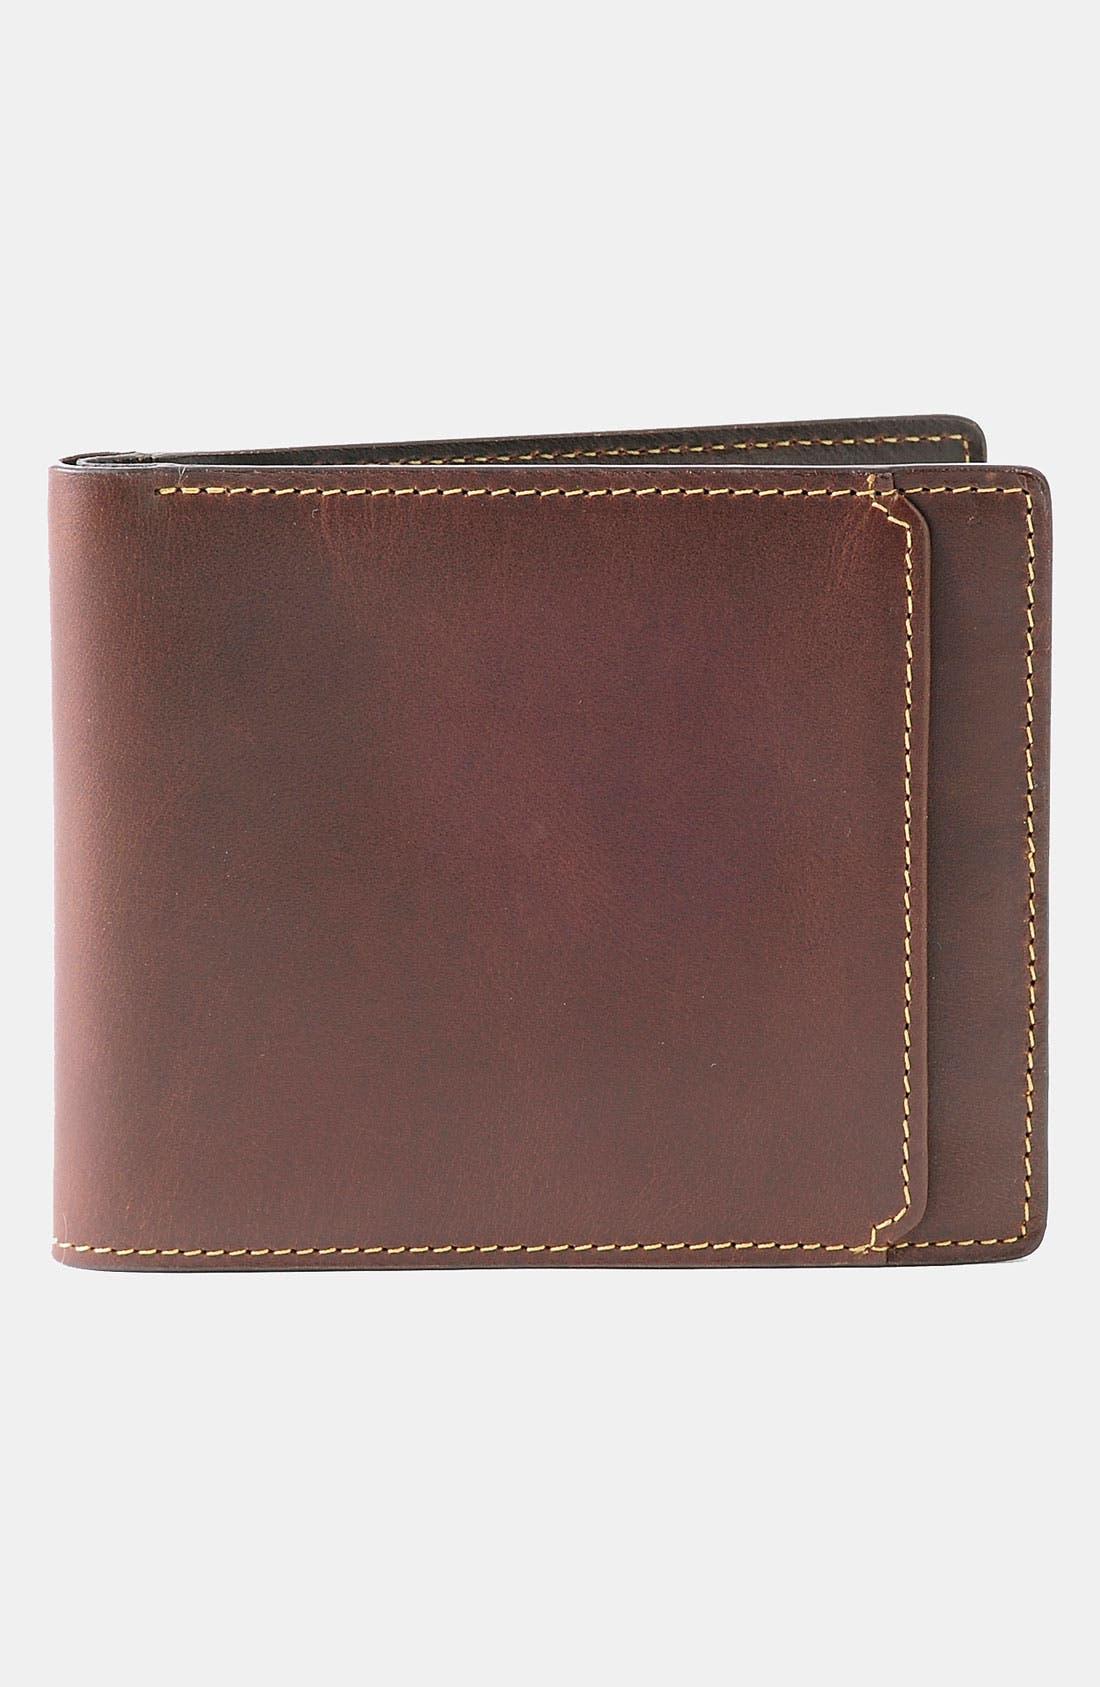 Alternate Image 1 Selected - Boconi 'Bryant' RFID Blocker Slimfold Wallet